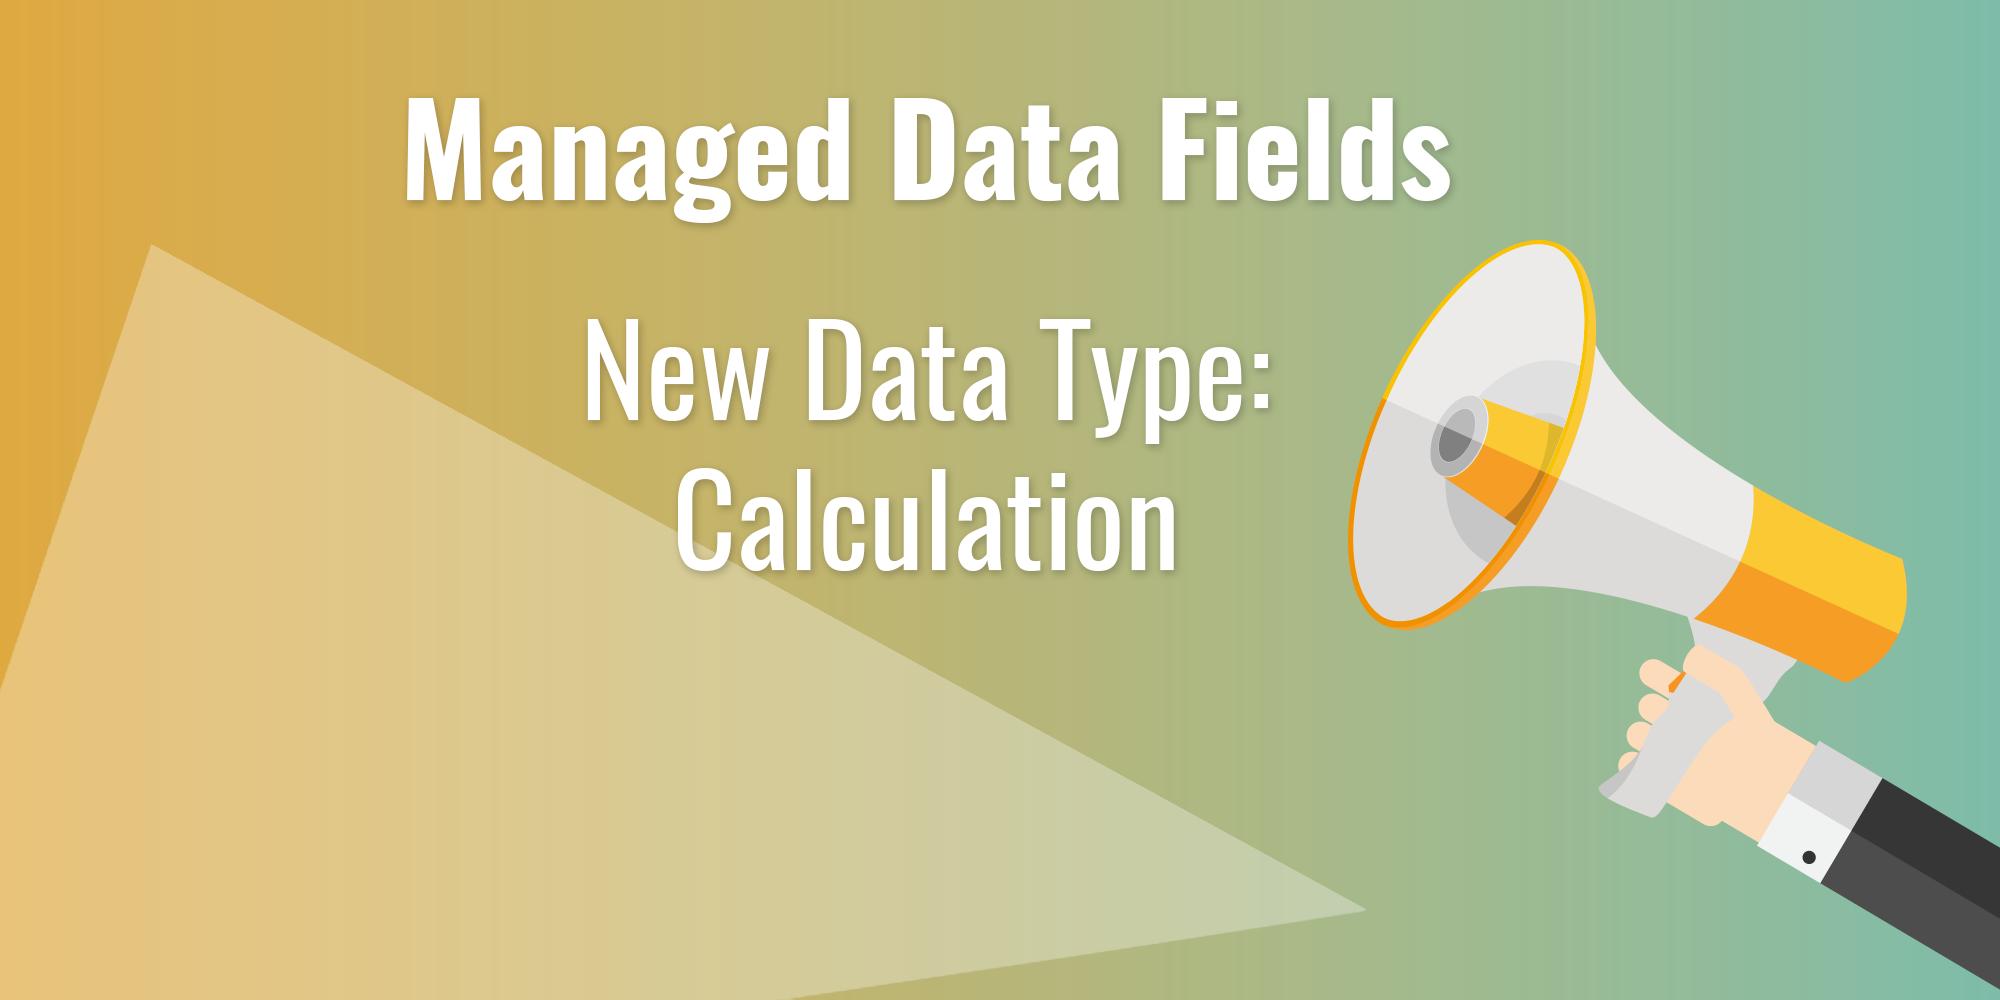 Managed Data Fields - New Data Type: Calculation